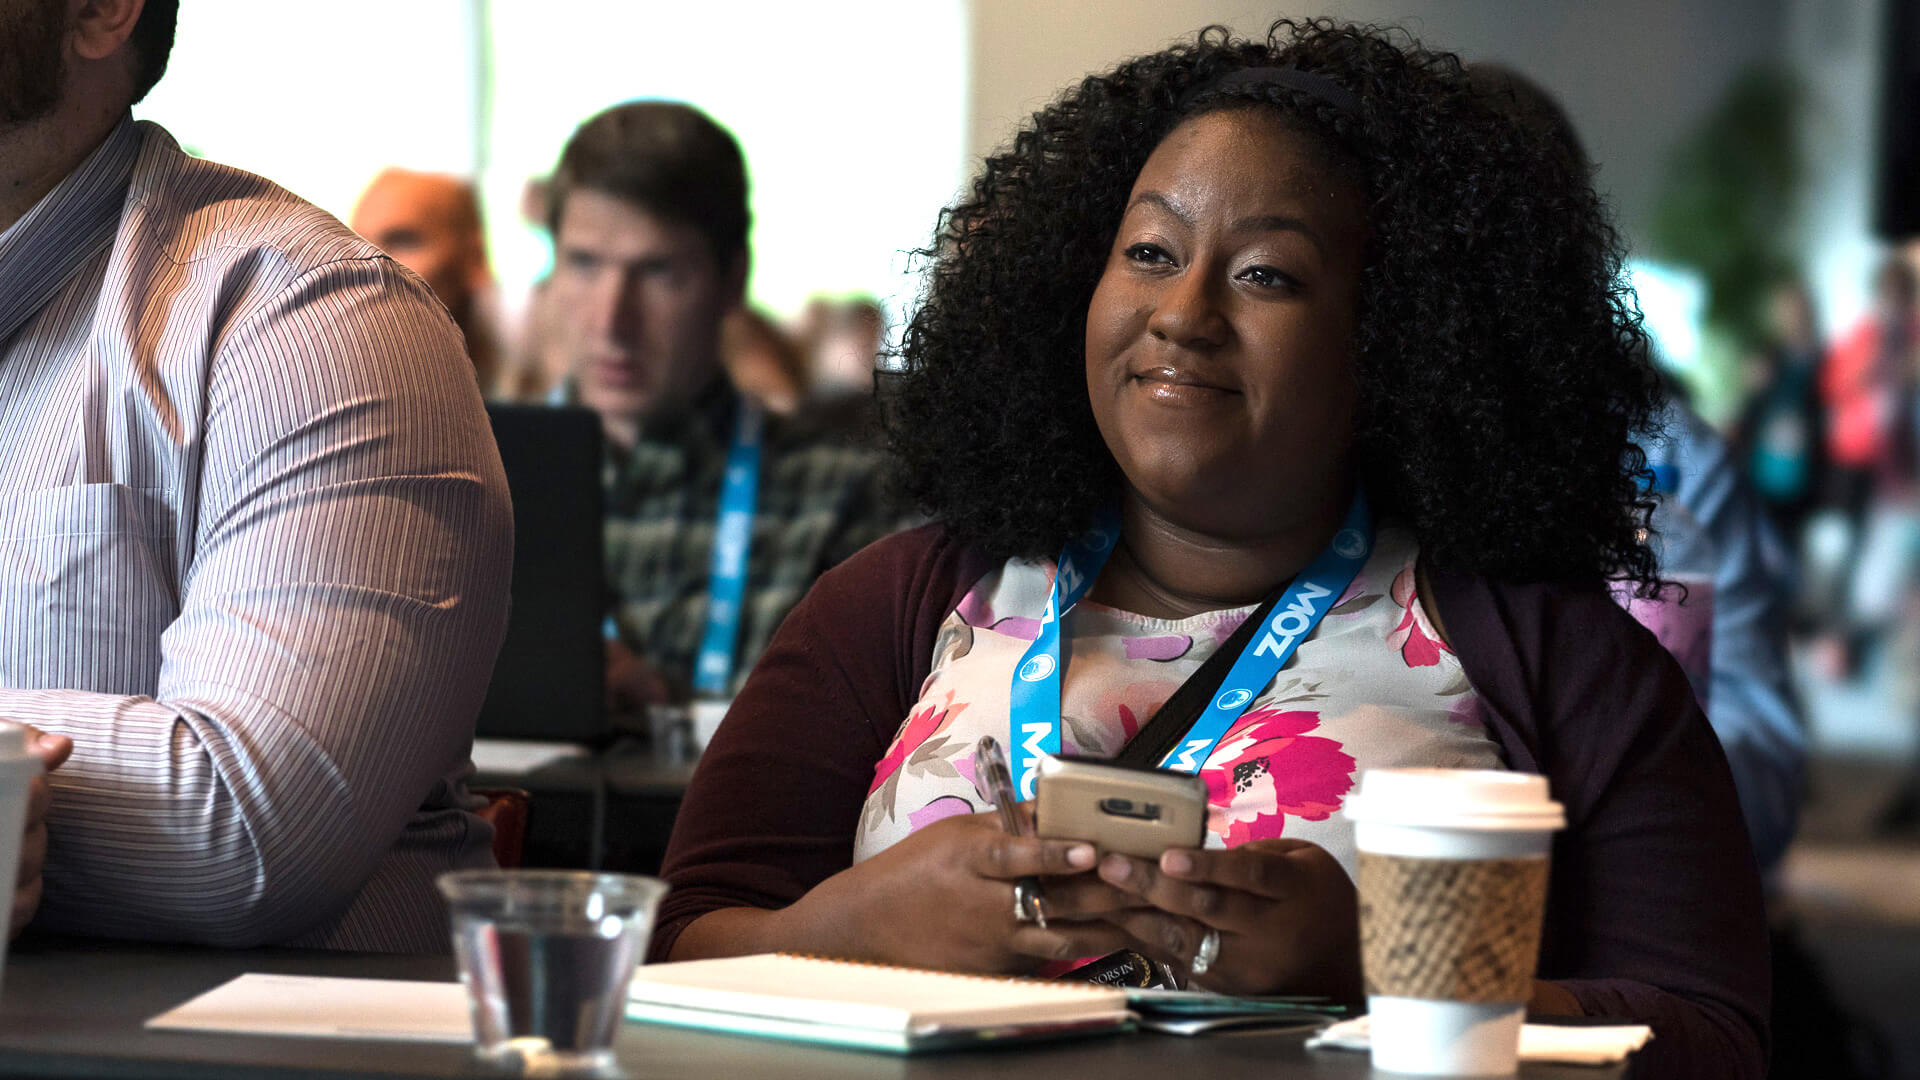 Sharpen your digital marketing skills with an SMX Advanced workshop